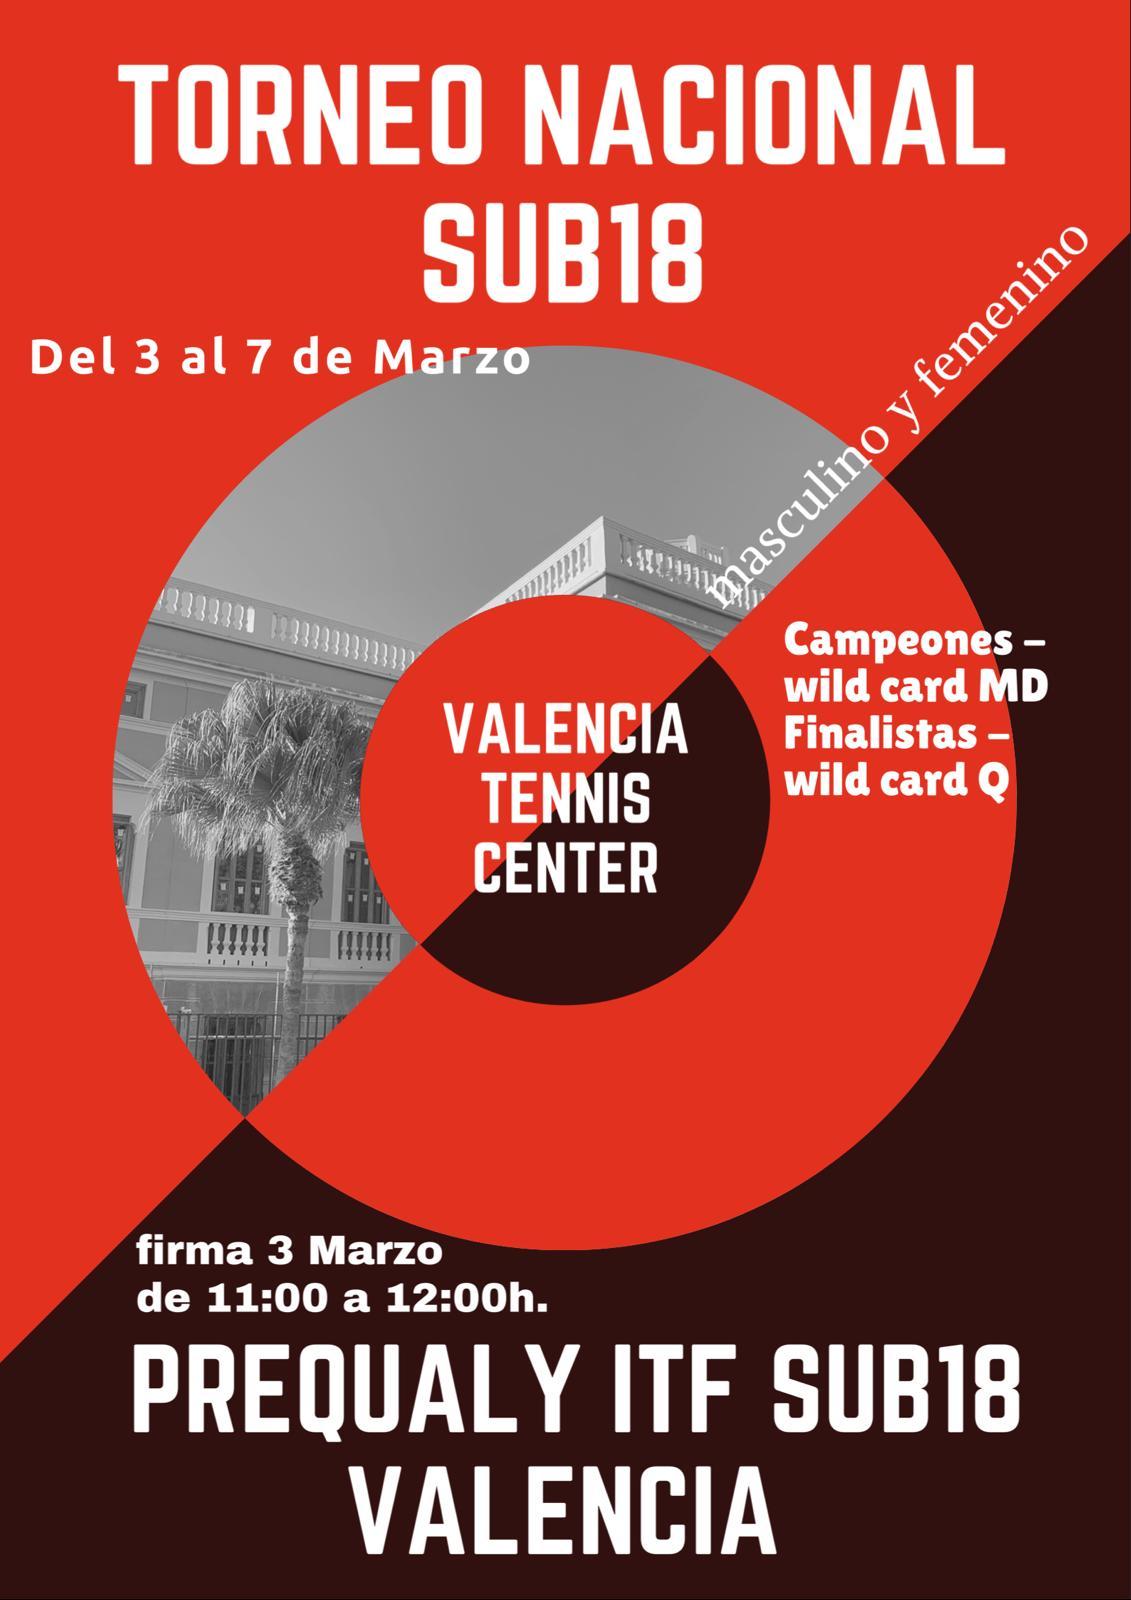 Torneo Nacional Sub18 Prequaly ITF 1